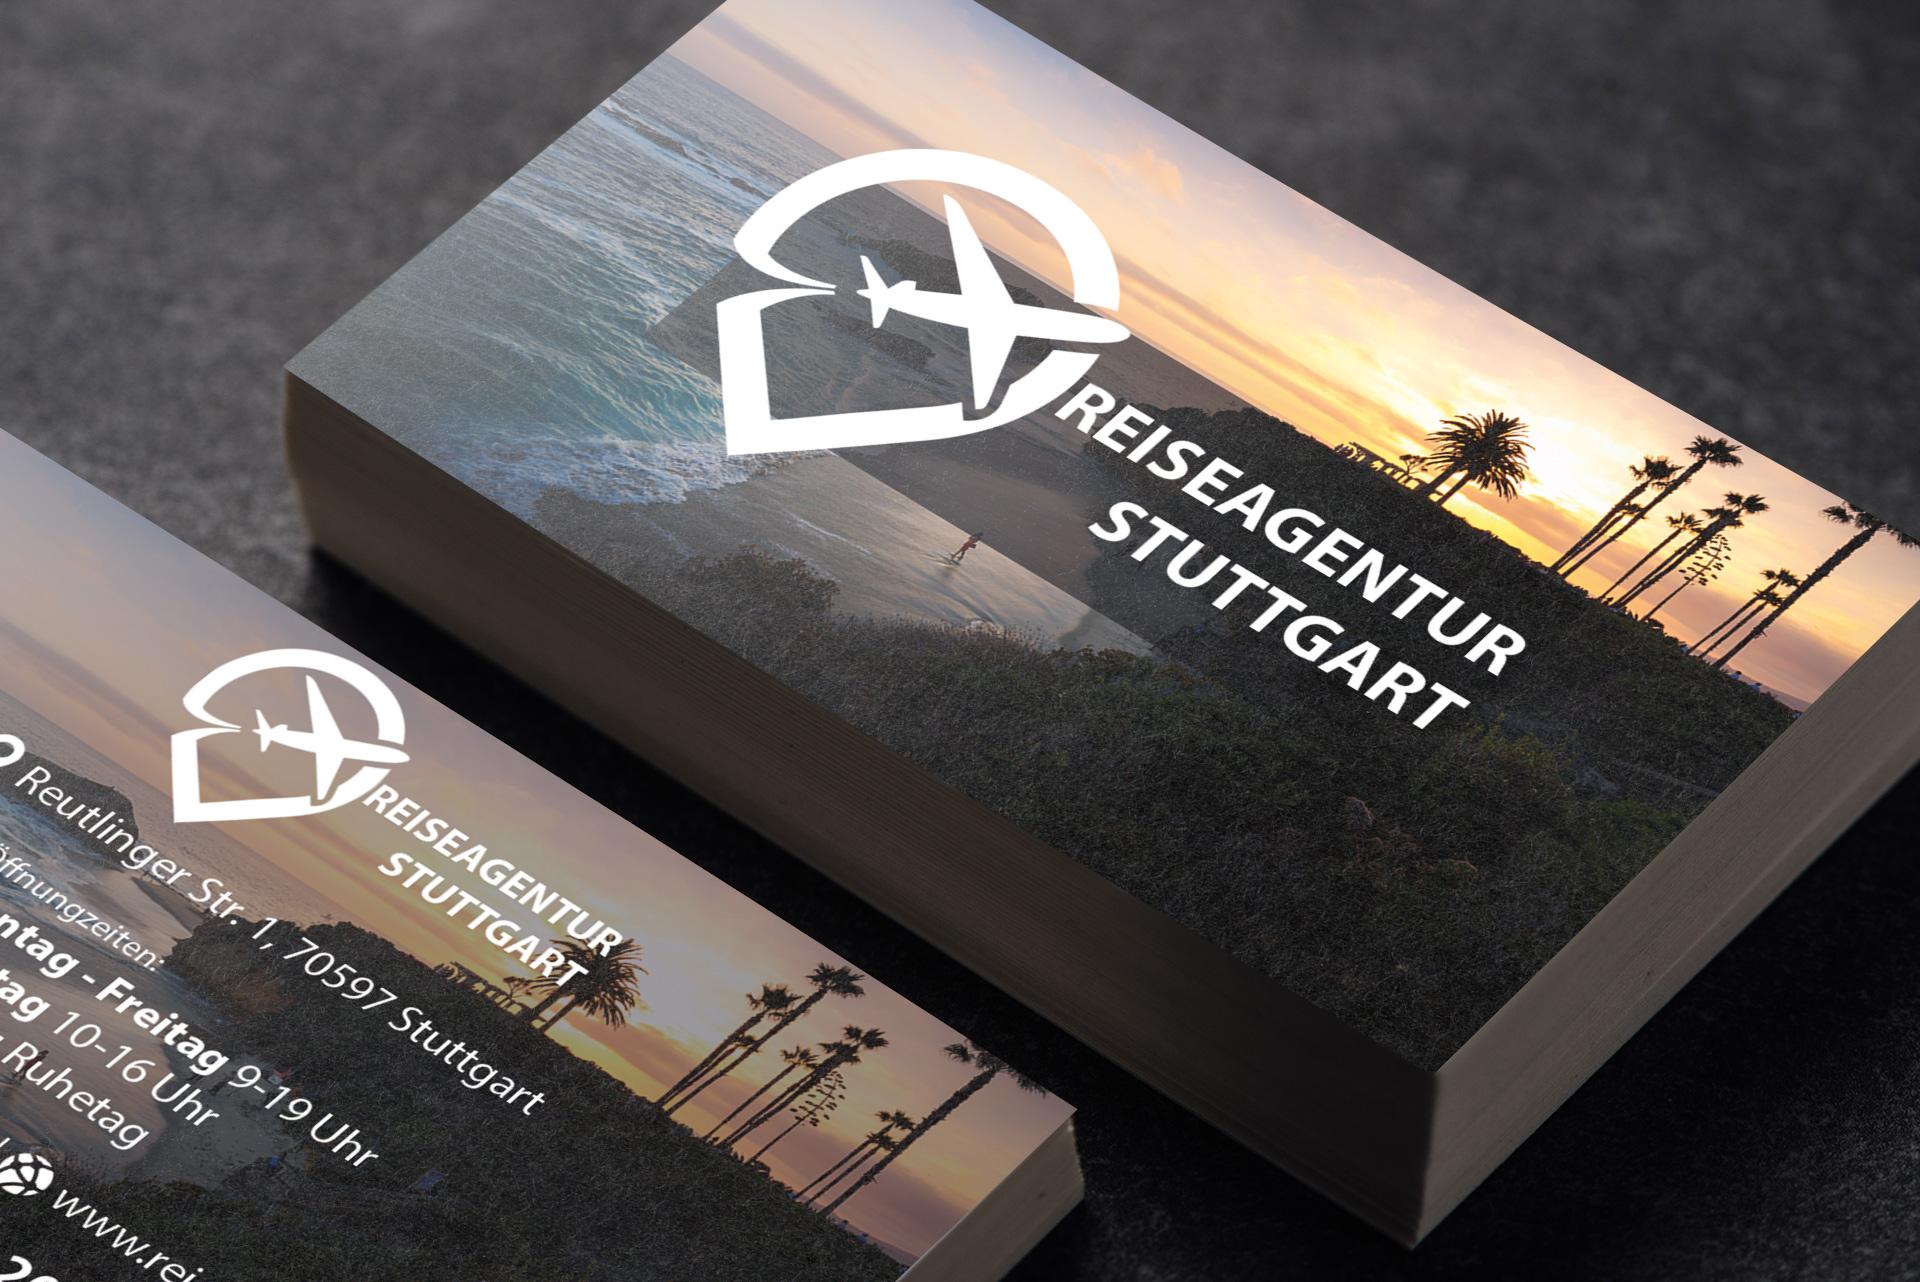 Reiseagentur Reisebüro Visitenkarte